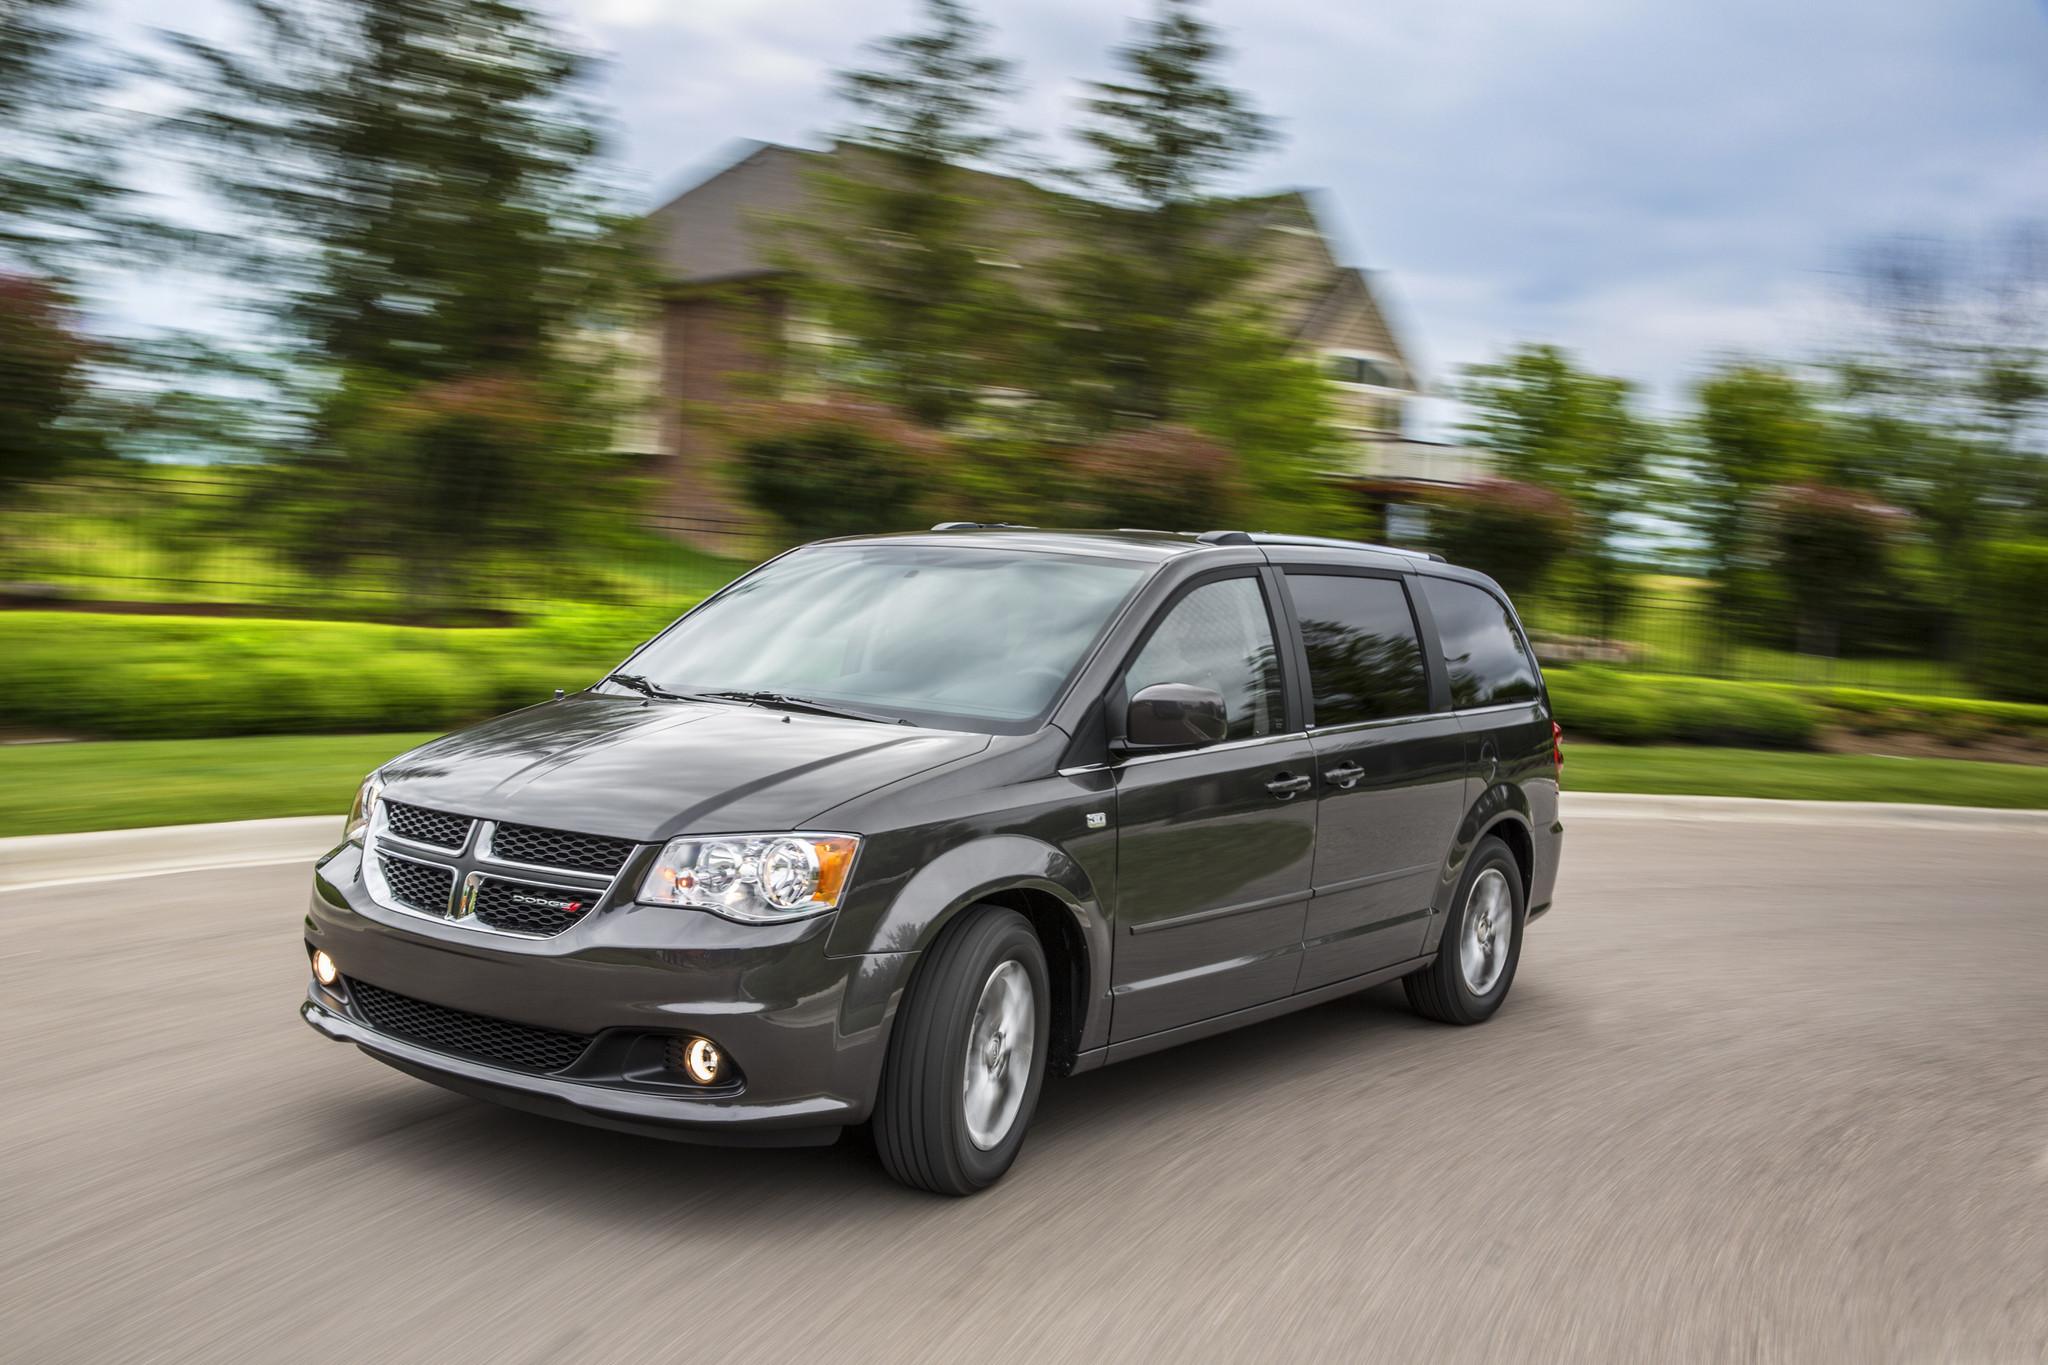 Fiat chrysler to expand jeep alfa romeo in company overhaul la times